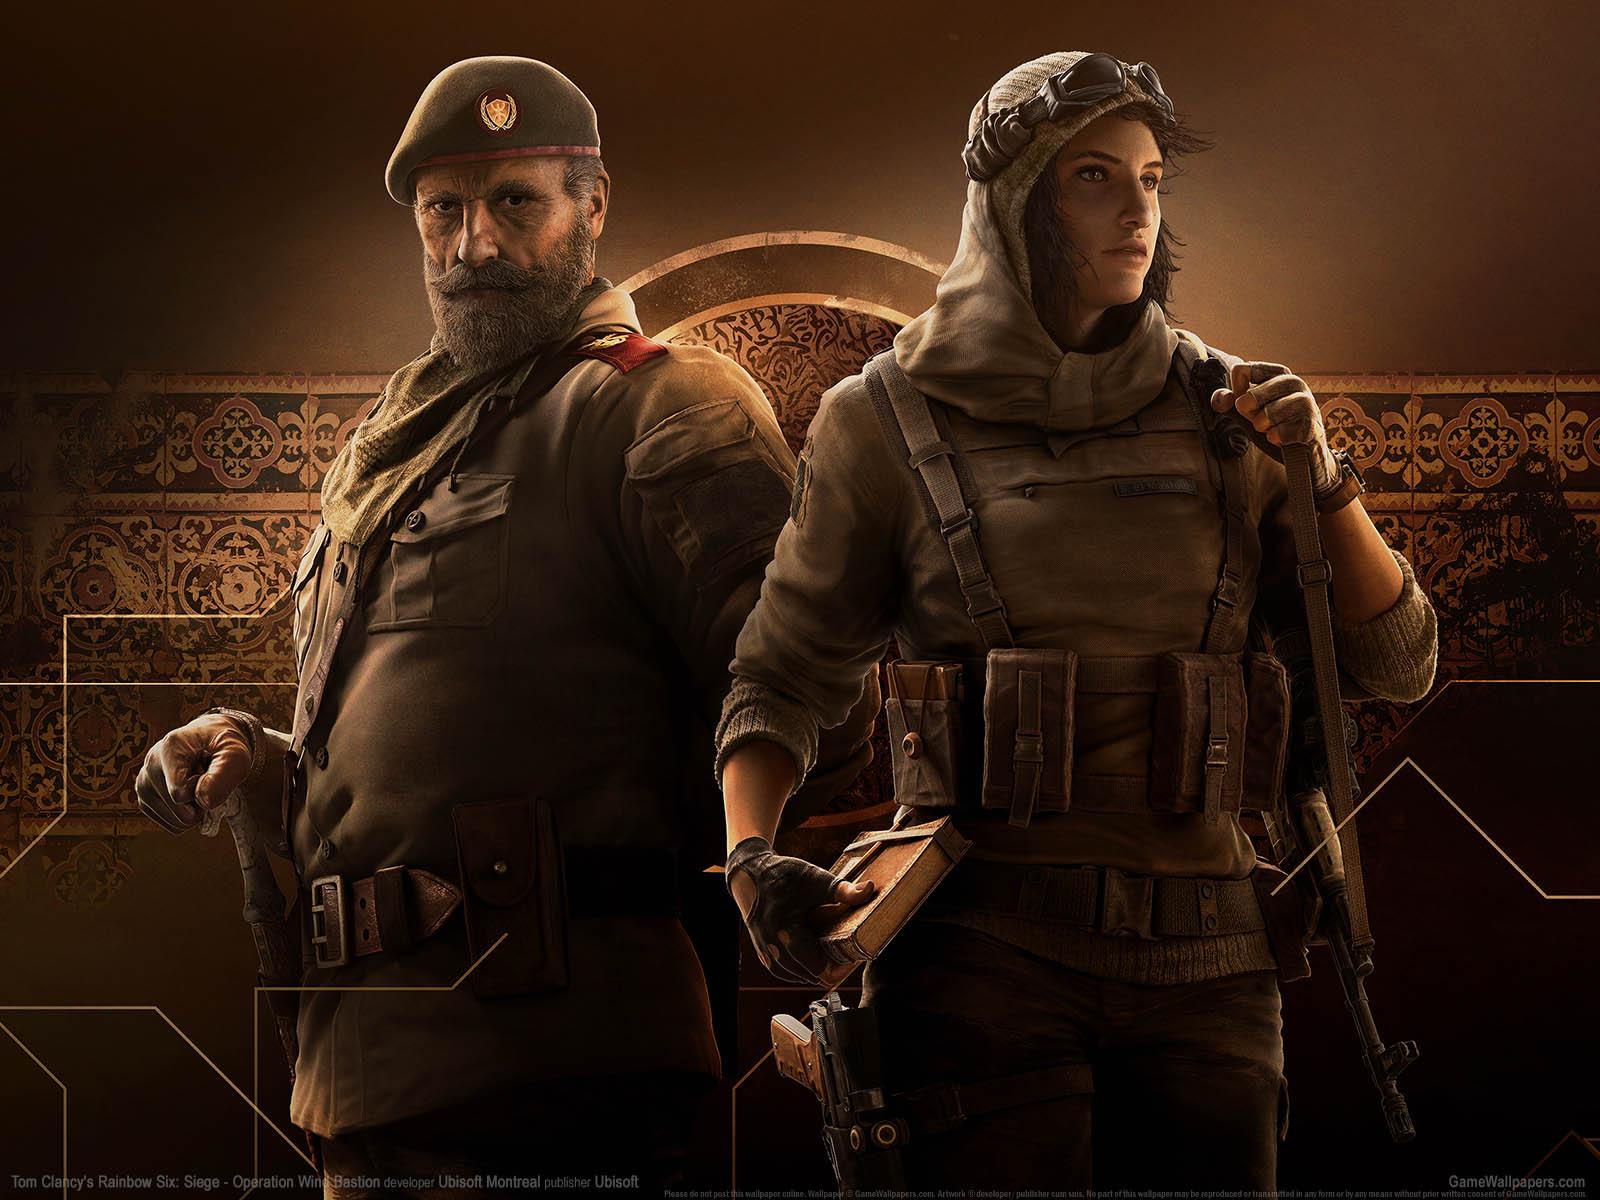 Tom Clancy's Rainbow Six: Siege - Operation Wind Bastionνmmer=02 Hintergrundbild  1600x1200